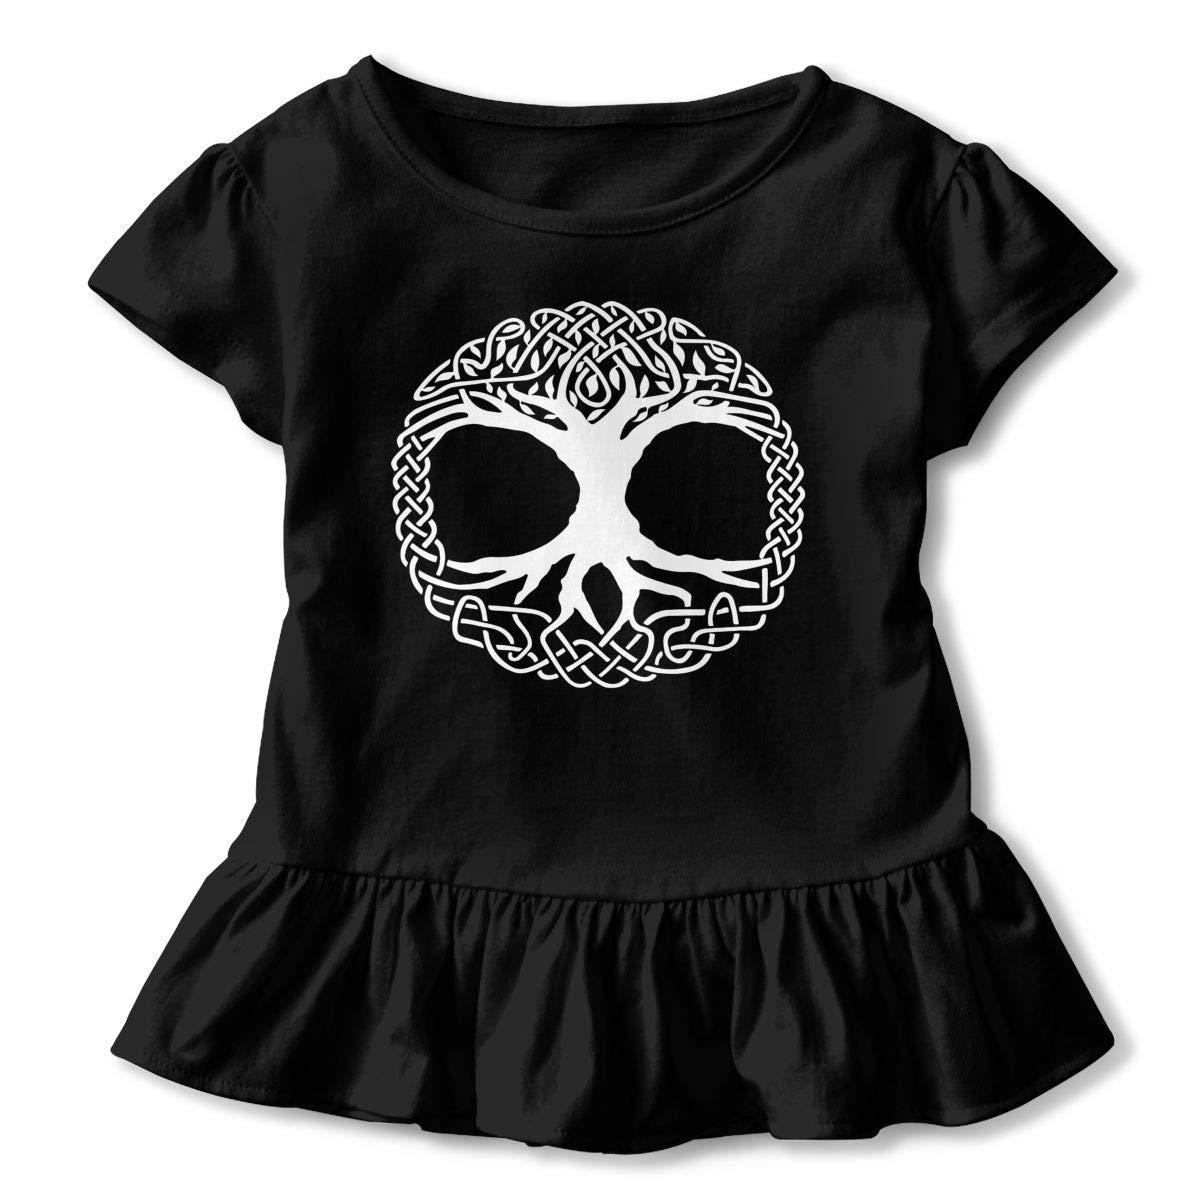 PMsunglasses Short Sleeve Celtic Tree of Life Shirts for Children 2-6T Kawaii Tunic Tops with Falbala